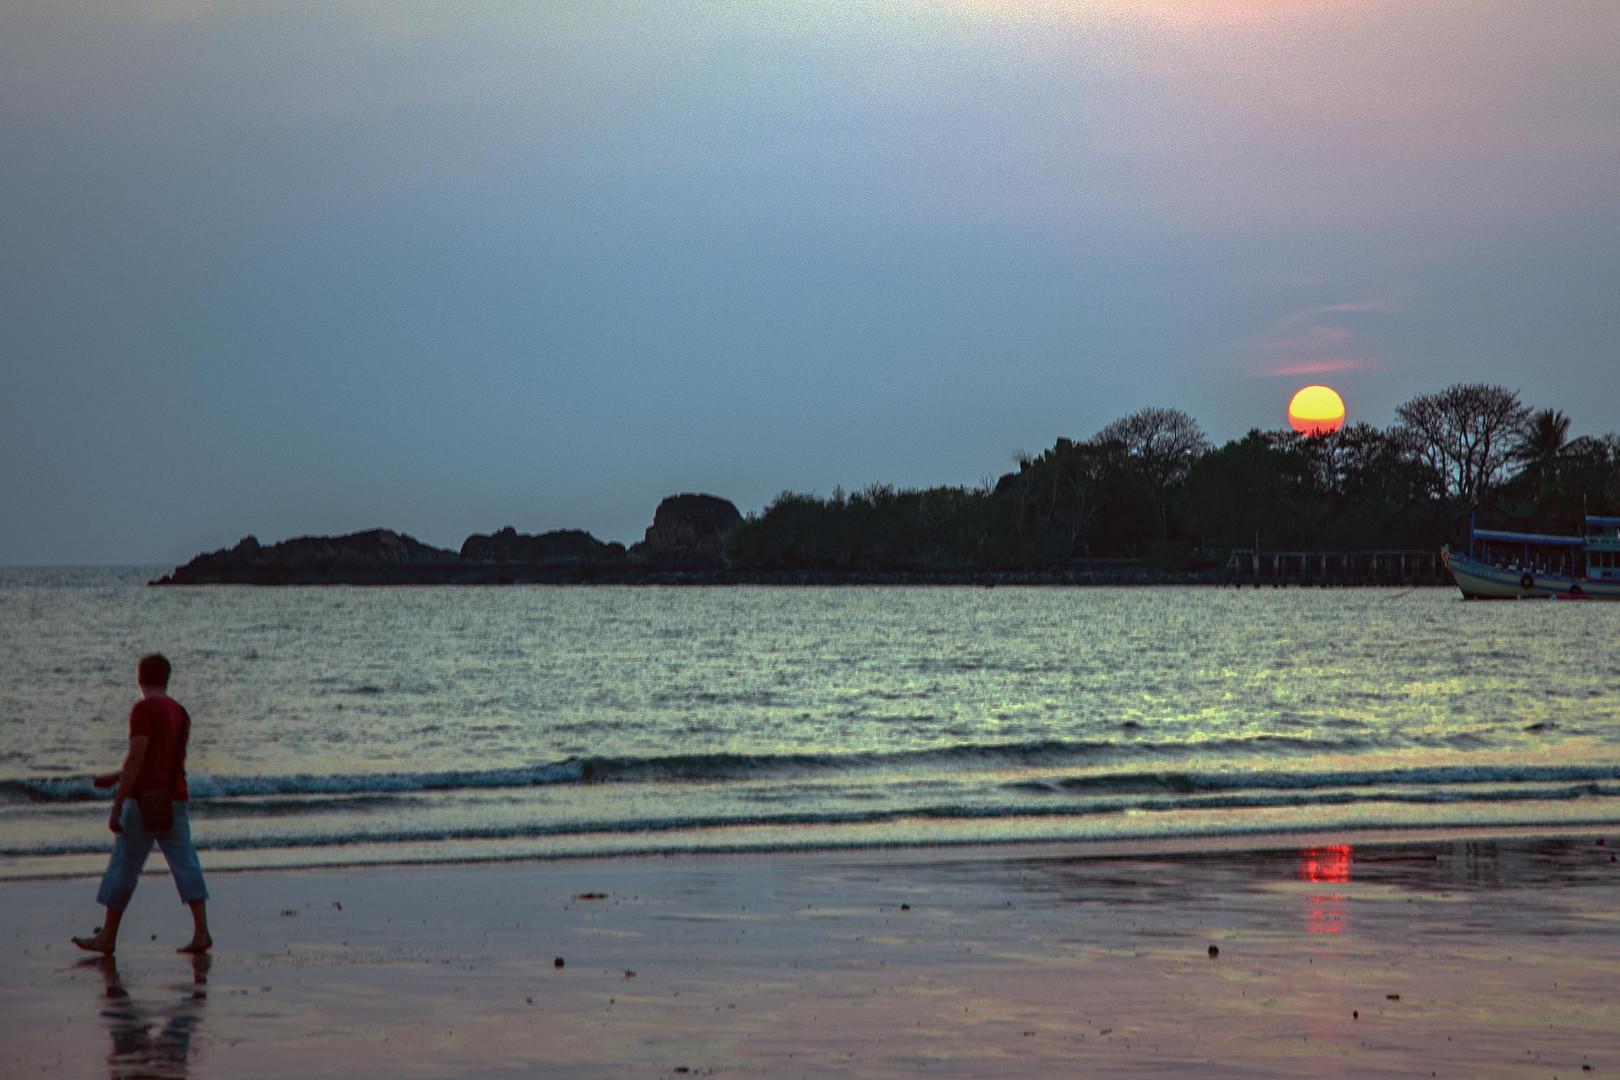 Sunset atmosphere at Klong Prao Beach